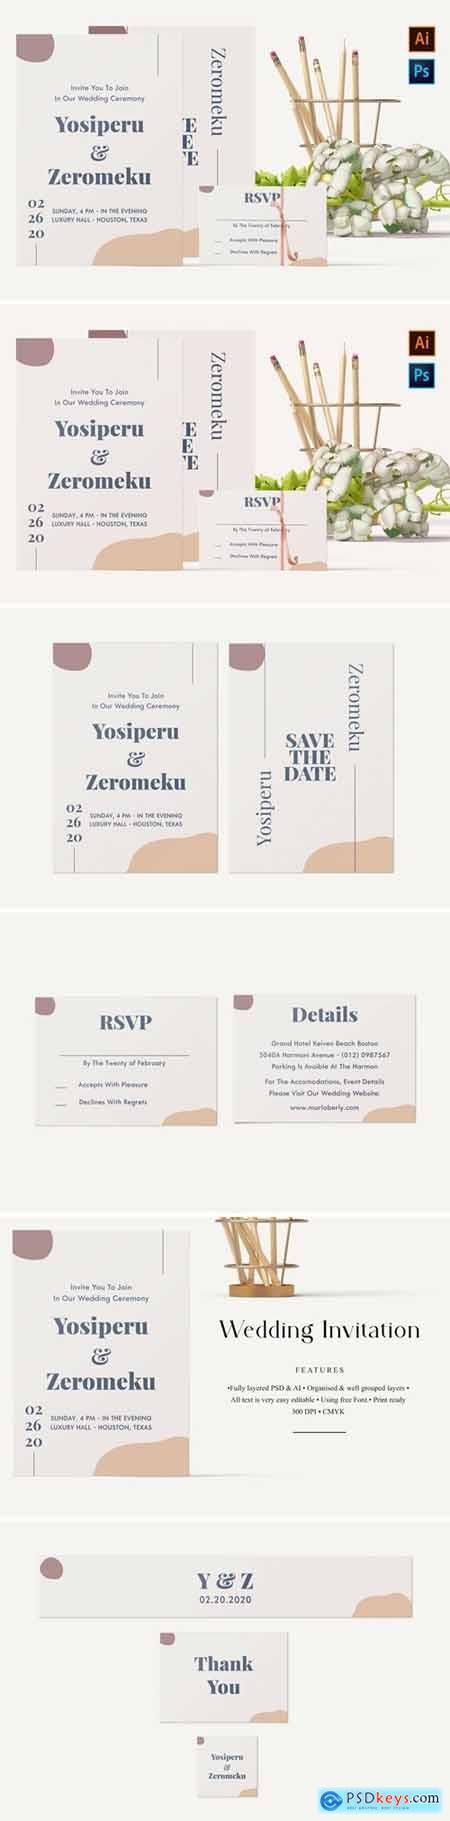 Yosiperu and Zeromeku-Wedding Invitation